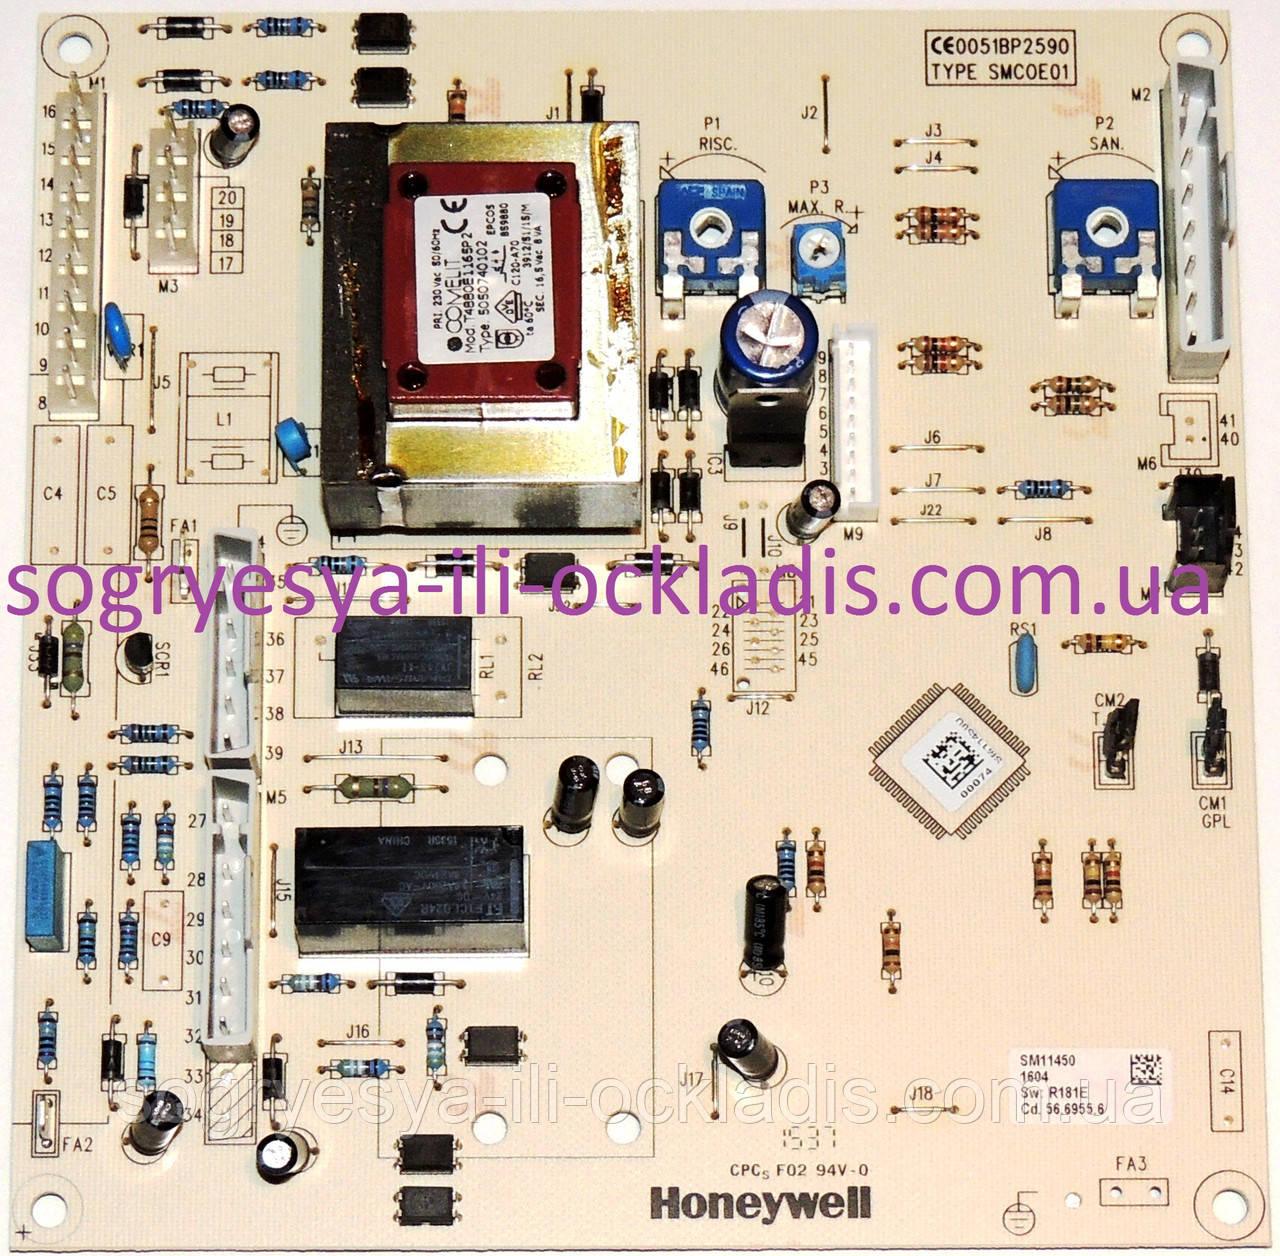 Плата управл. Honeywell SM11450U с ГК VK4105M (фир.уп, EU-Е) Baxi Eco, Westen Energy, арт.5669550, к.з.0823